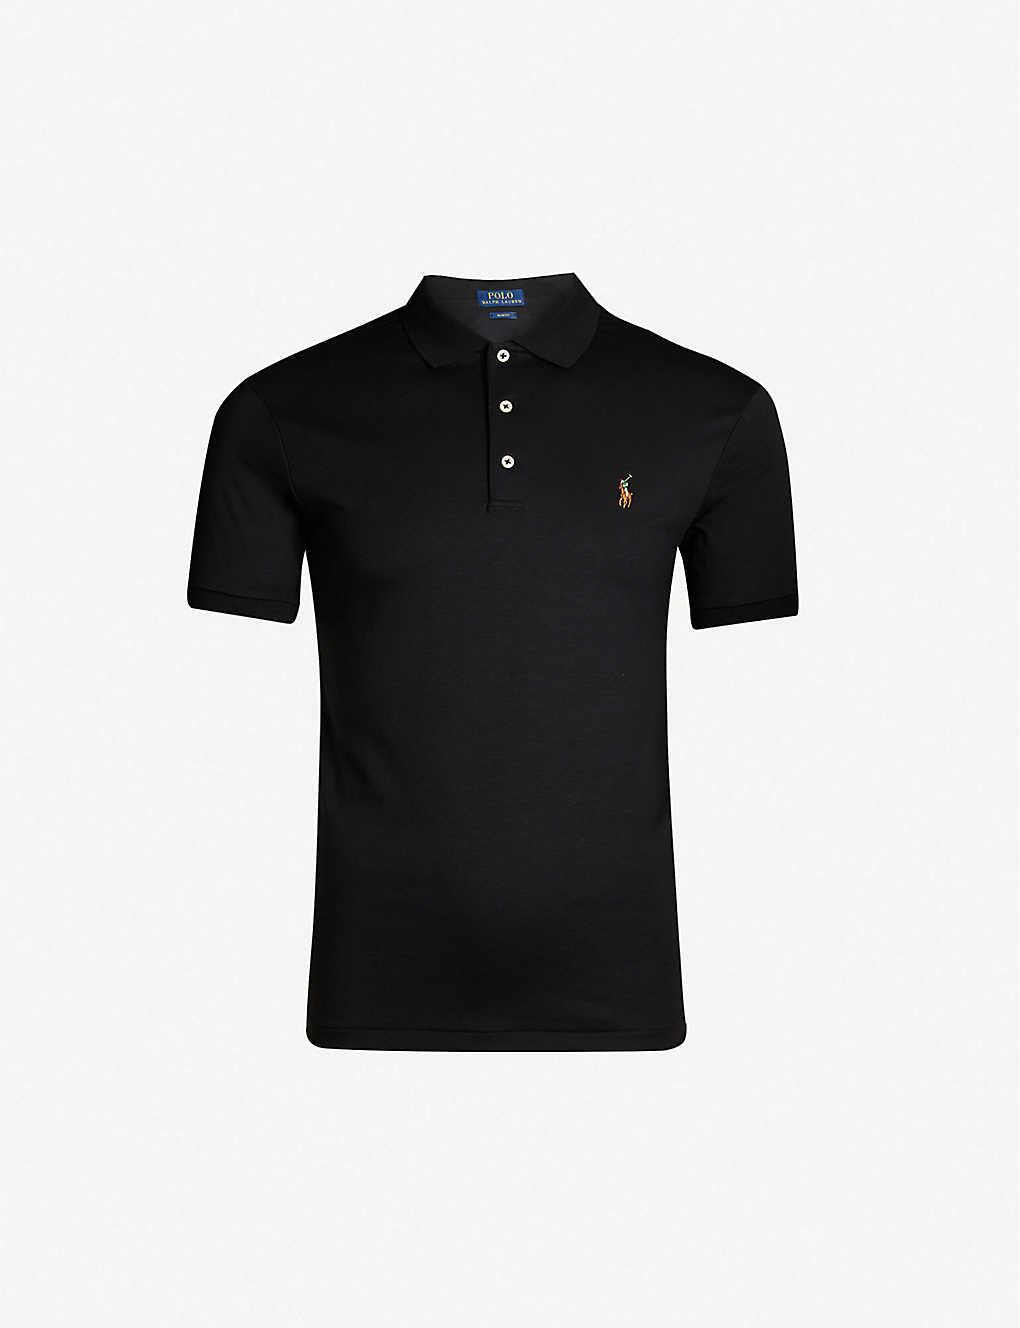 0513211a2 POLO RALPH LAUREN - Pima Soft Touch cotton polo shirt | Selfridges.com